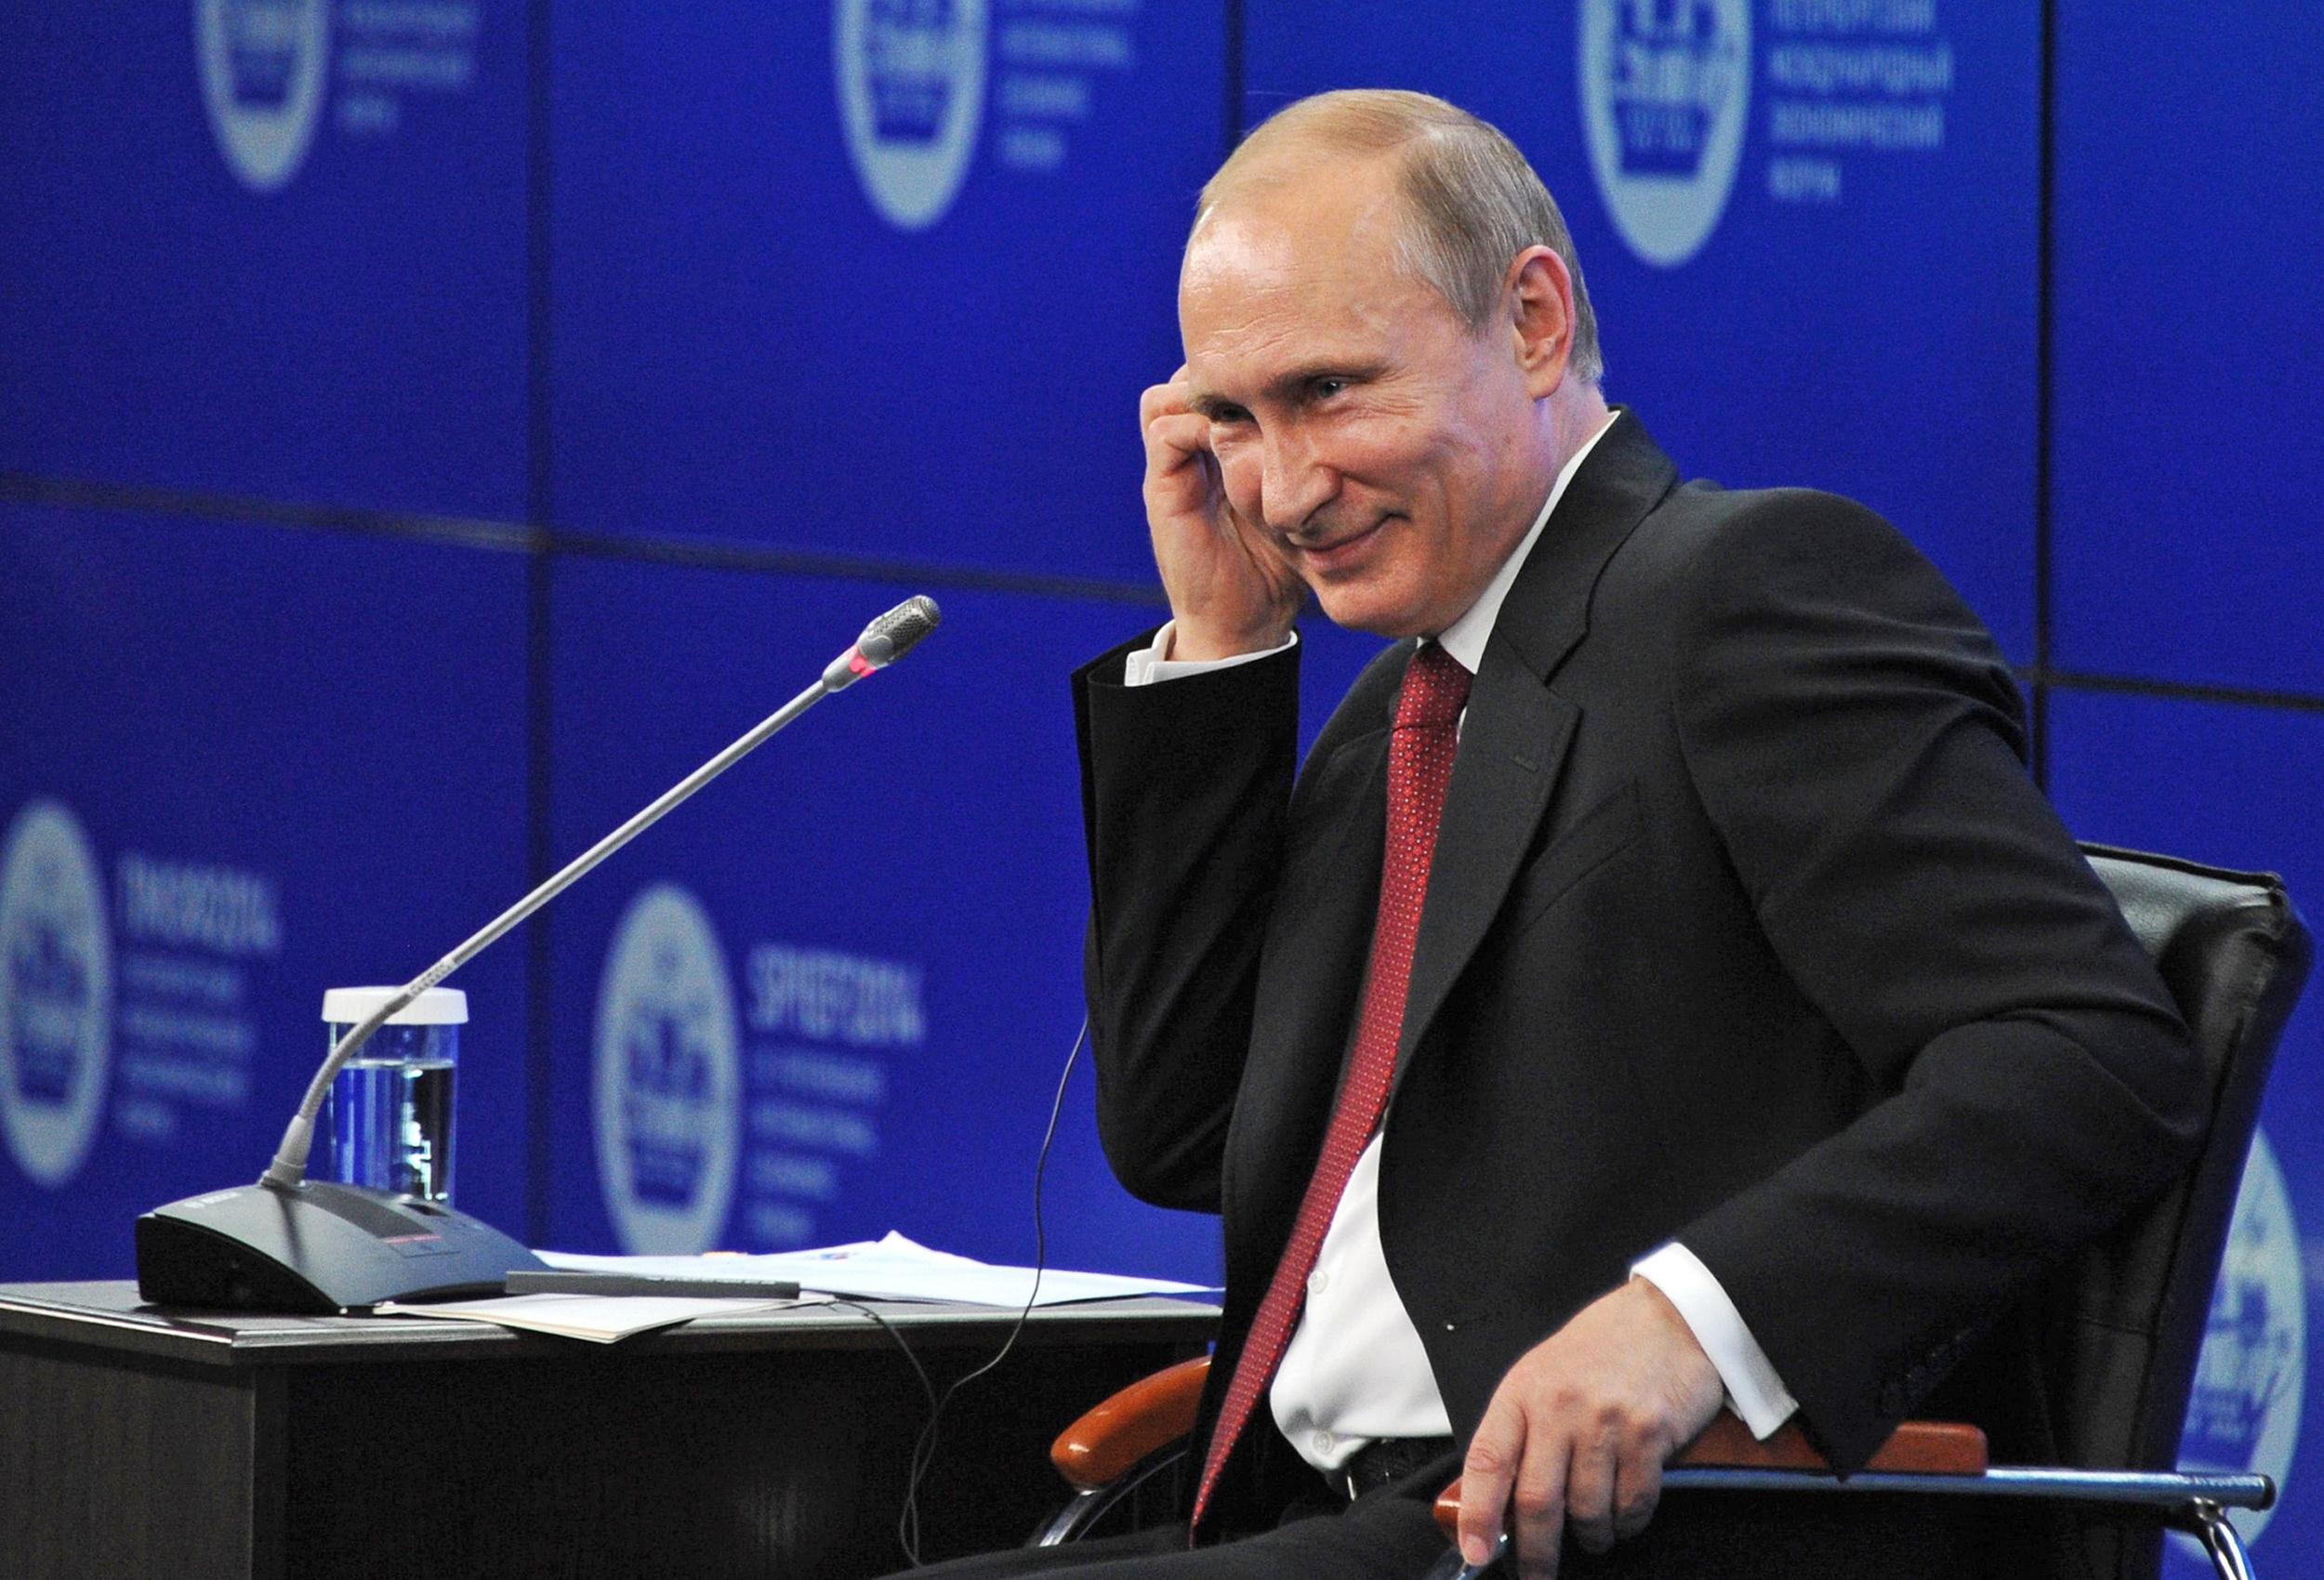 Image: RUSSIA-PUTIN